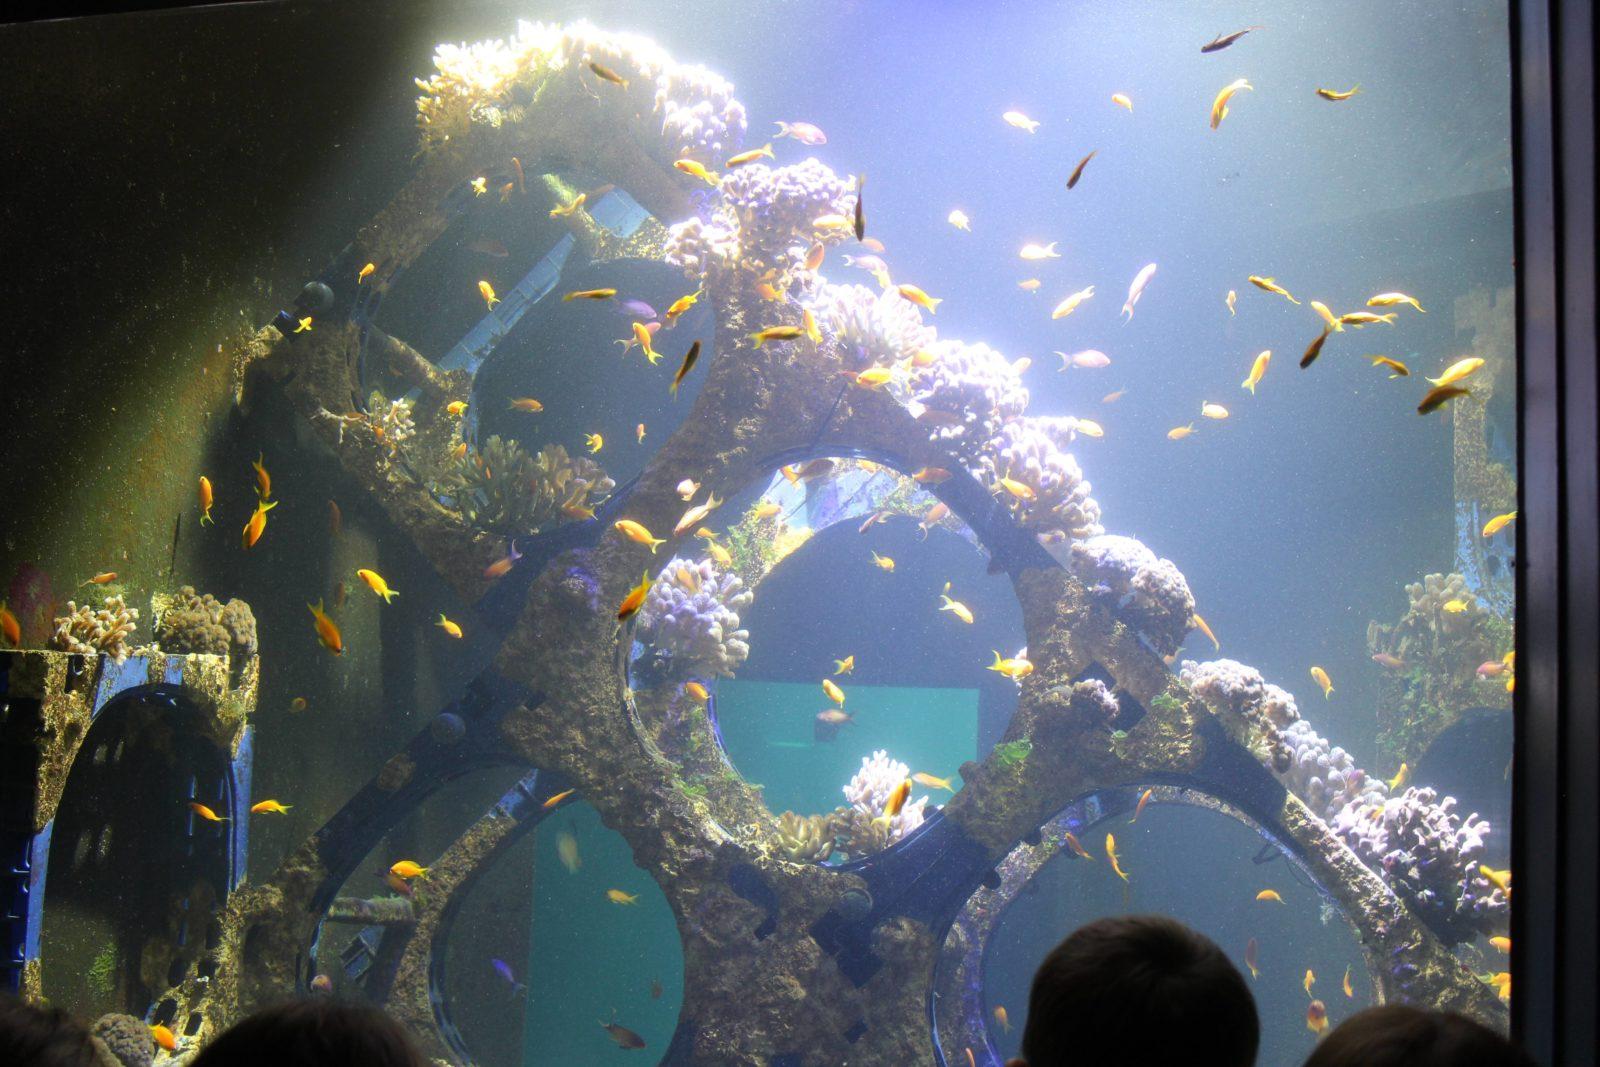 Nausicaa Boulogne-sur-Mer poissons et rochers